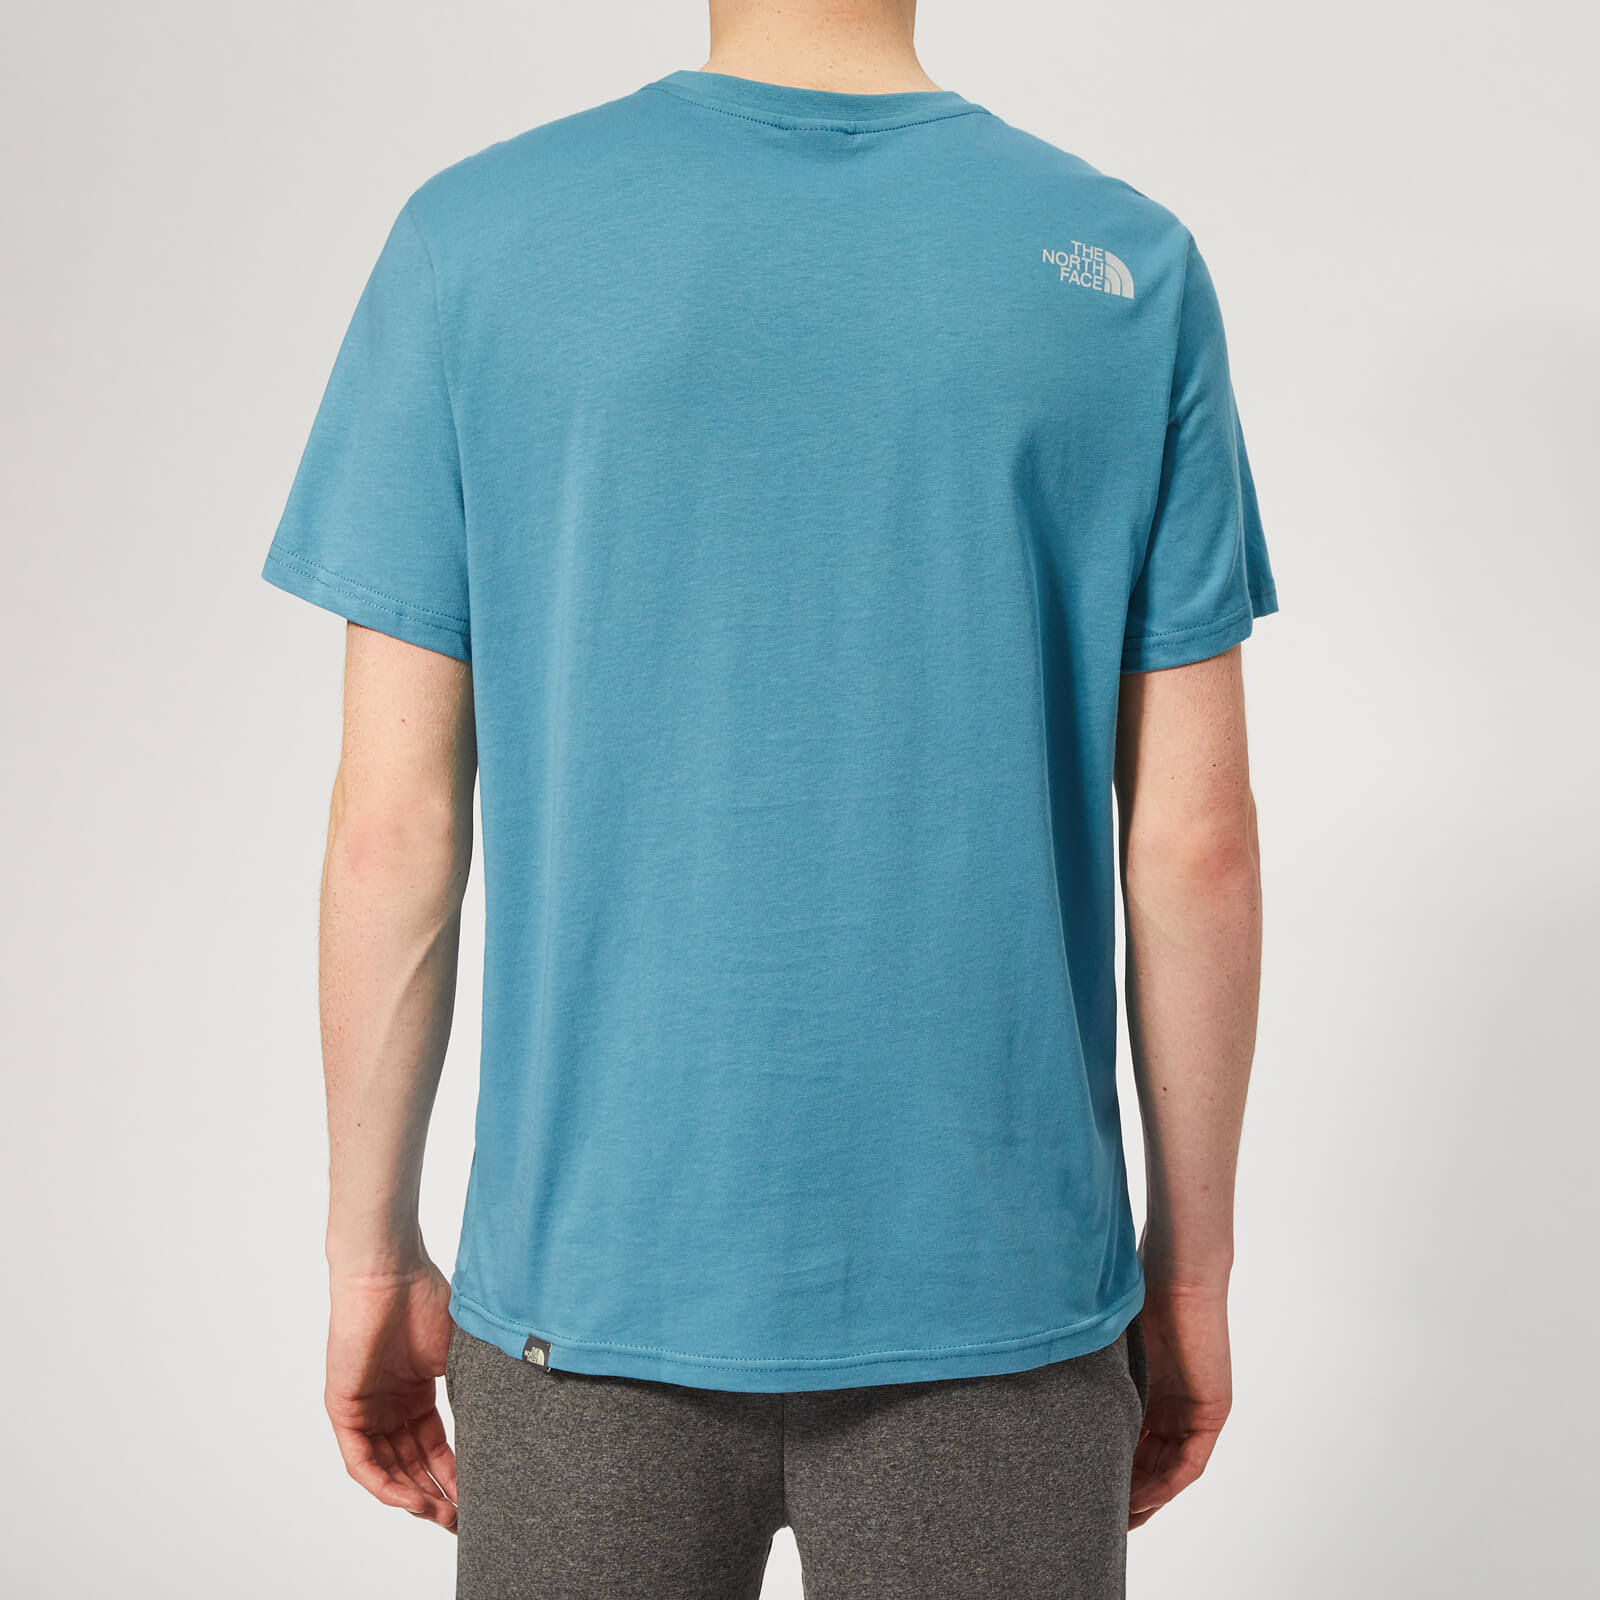 North Simple Turquesa Dome S Face Camiseta The Azul BqPtUt5w